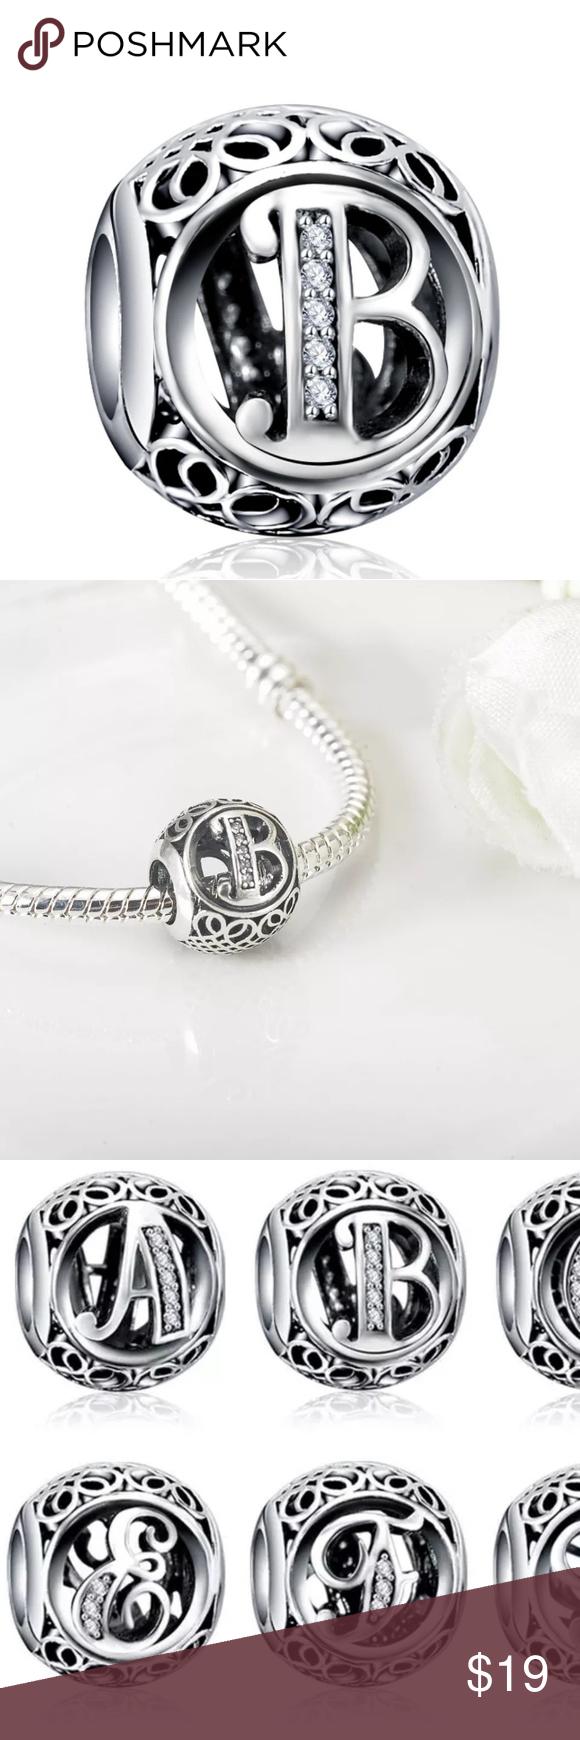 Charm Letter B Pandora Charm Bracelet Pandora Charms Jewelry Bracelets